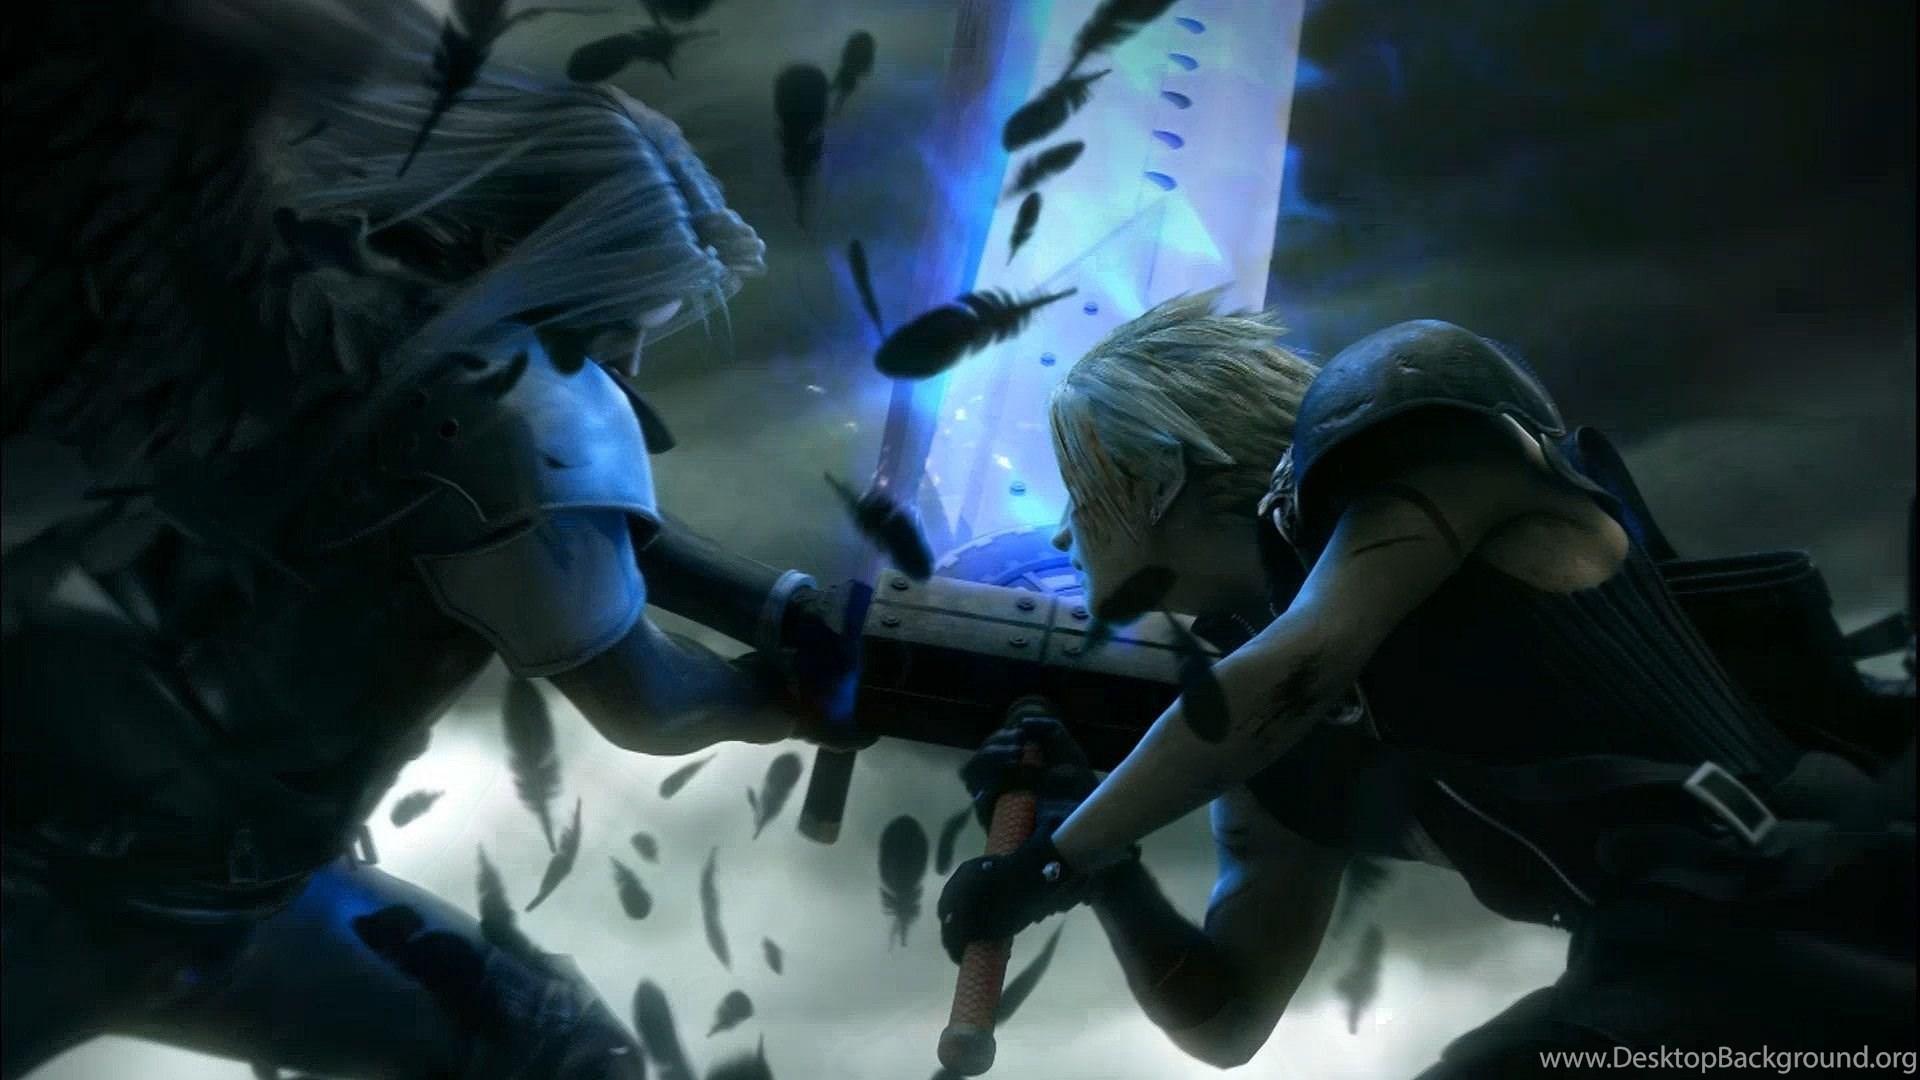 Final Fantasy 7 Hd Wallpapers Wallpapers Cave Desktop Background